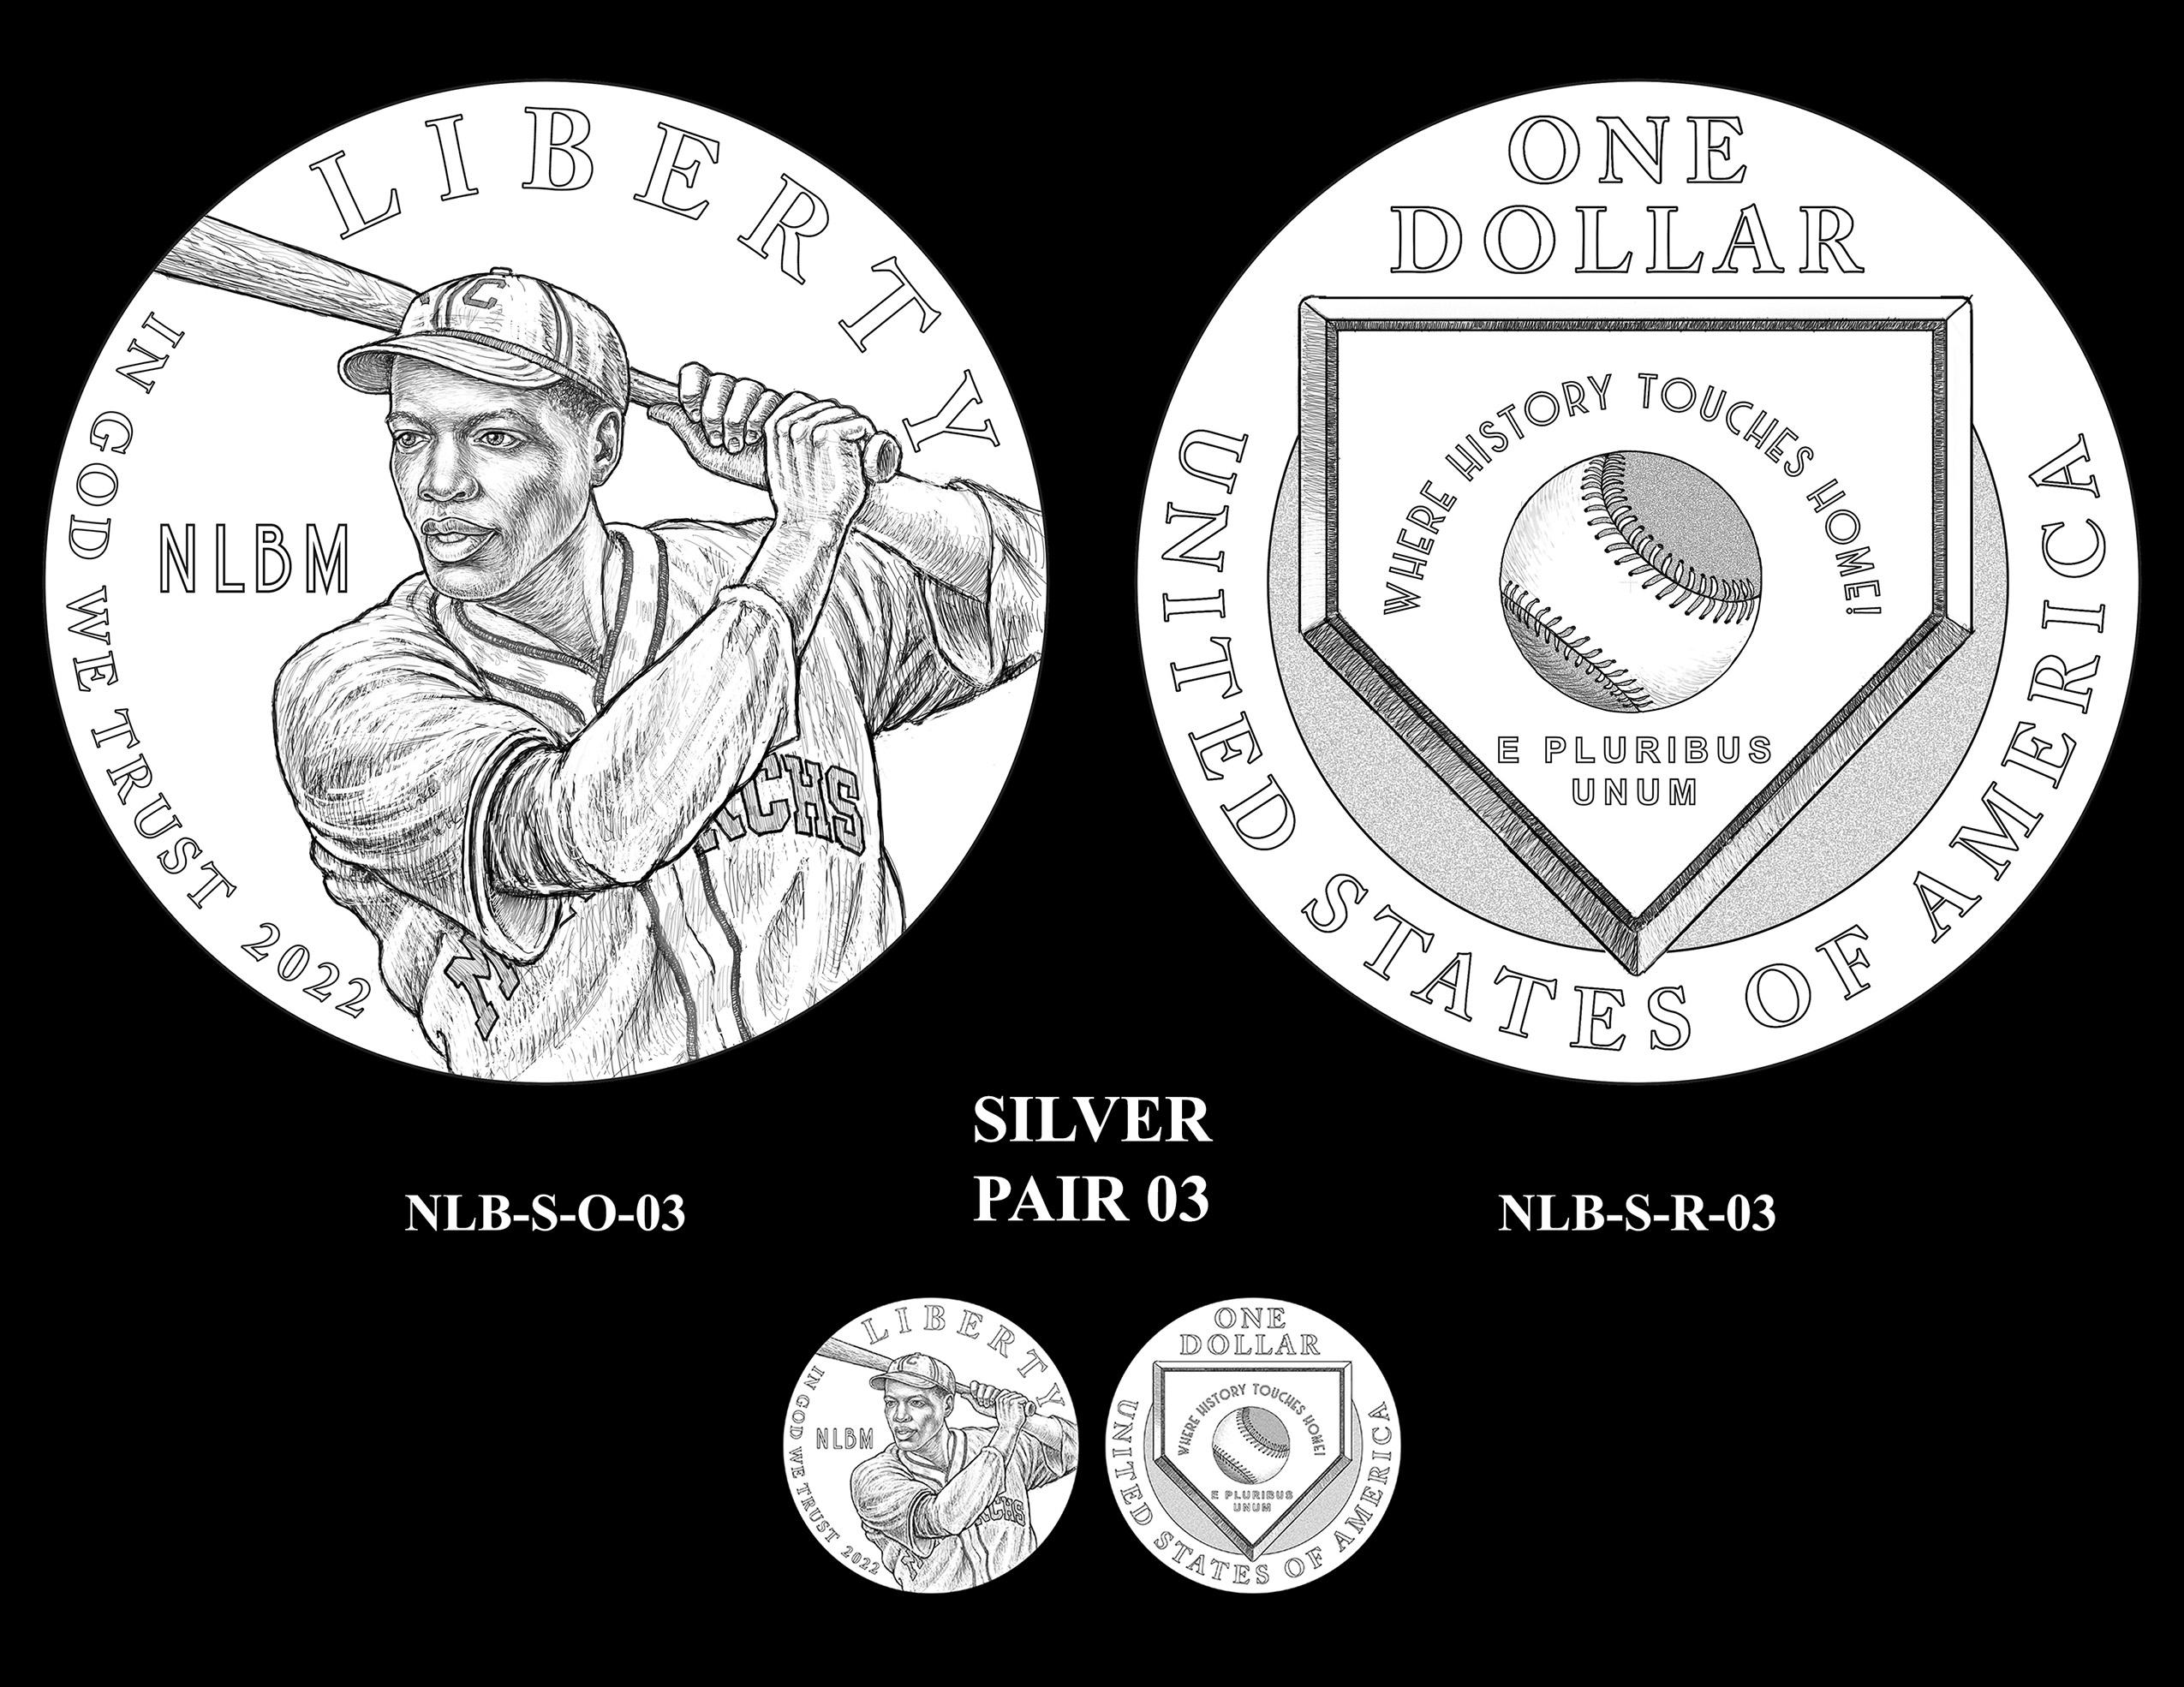 Silver Pair 03 -- Negro Leagues Baseball Commemorative Coin Program